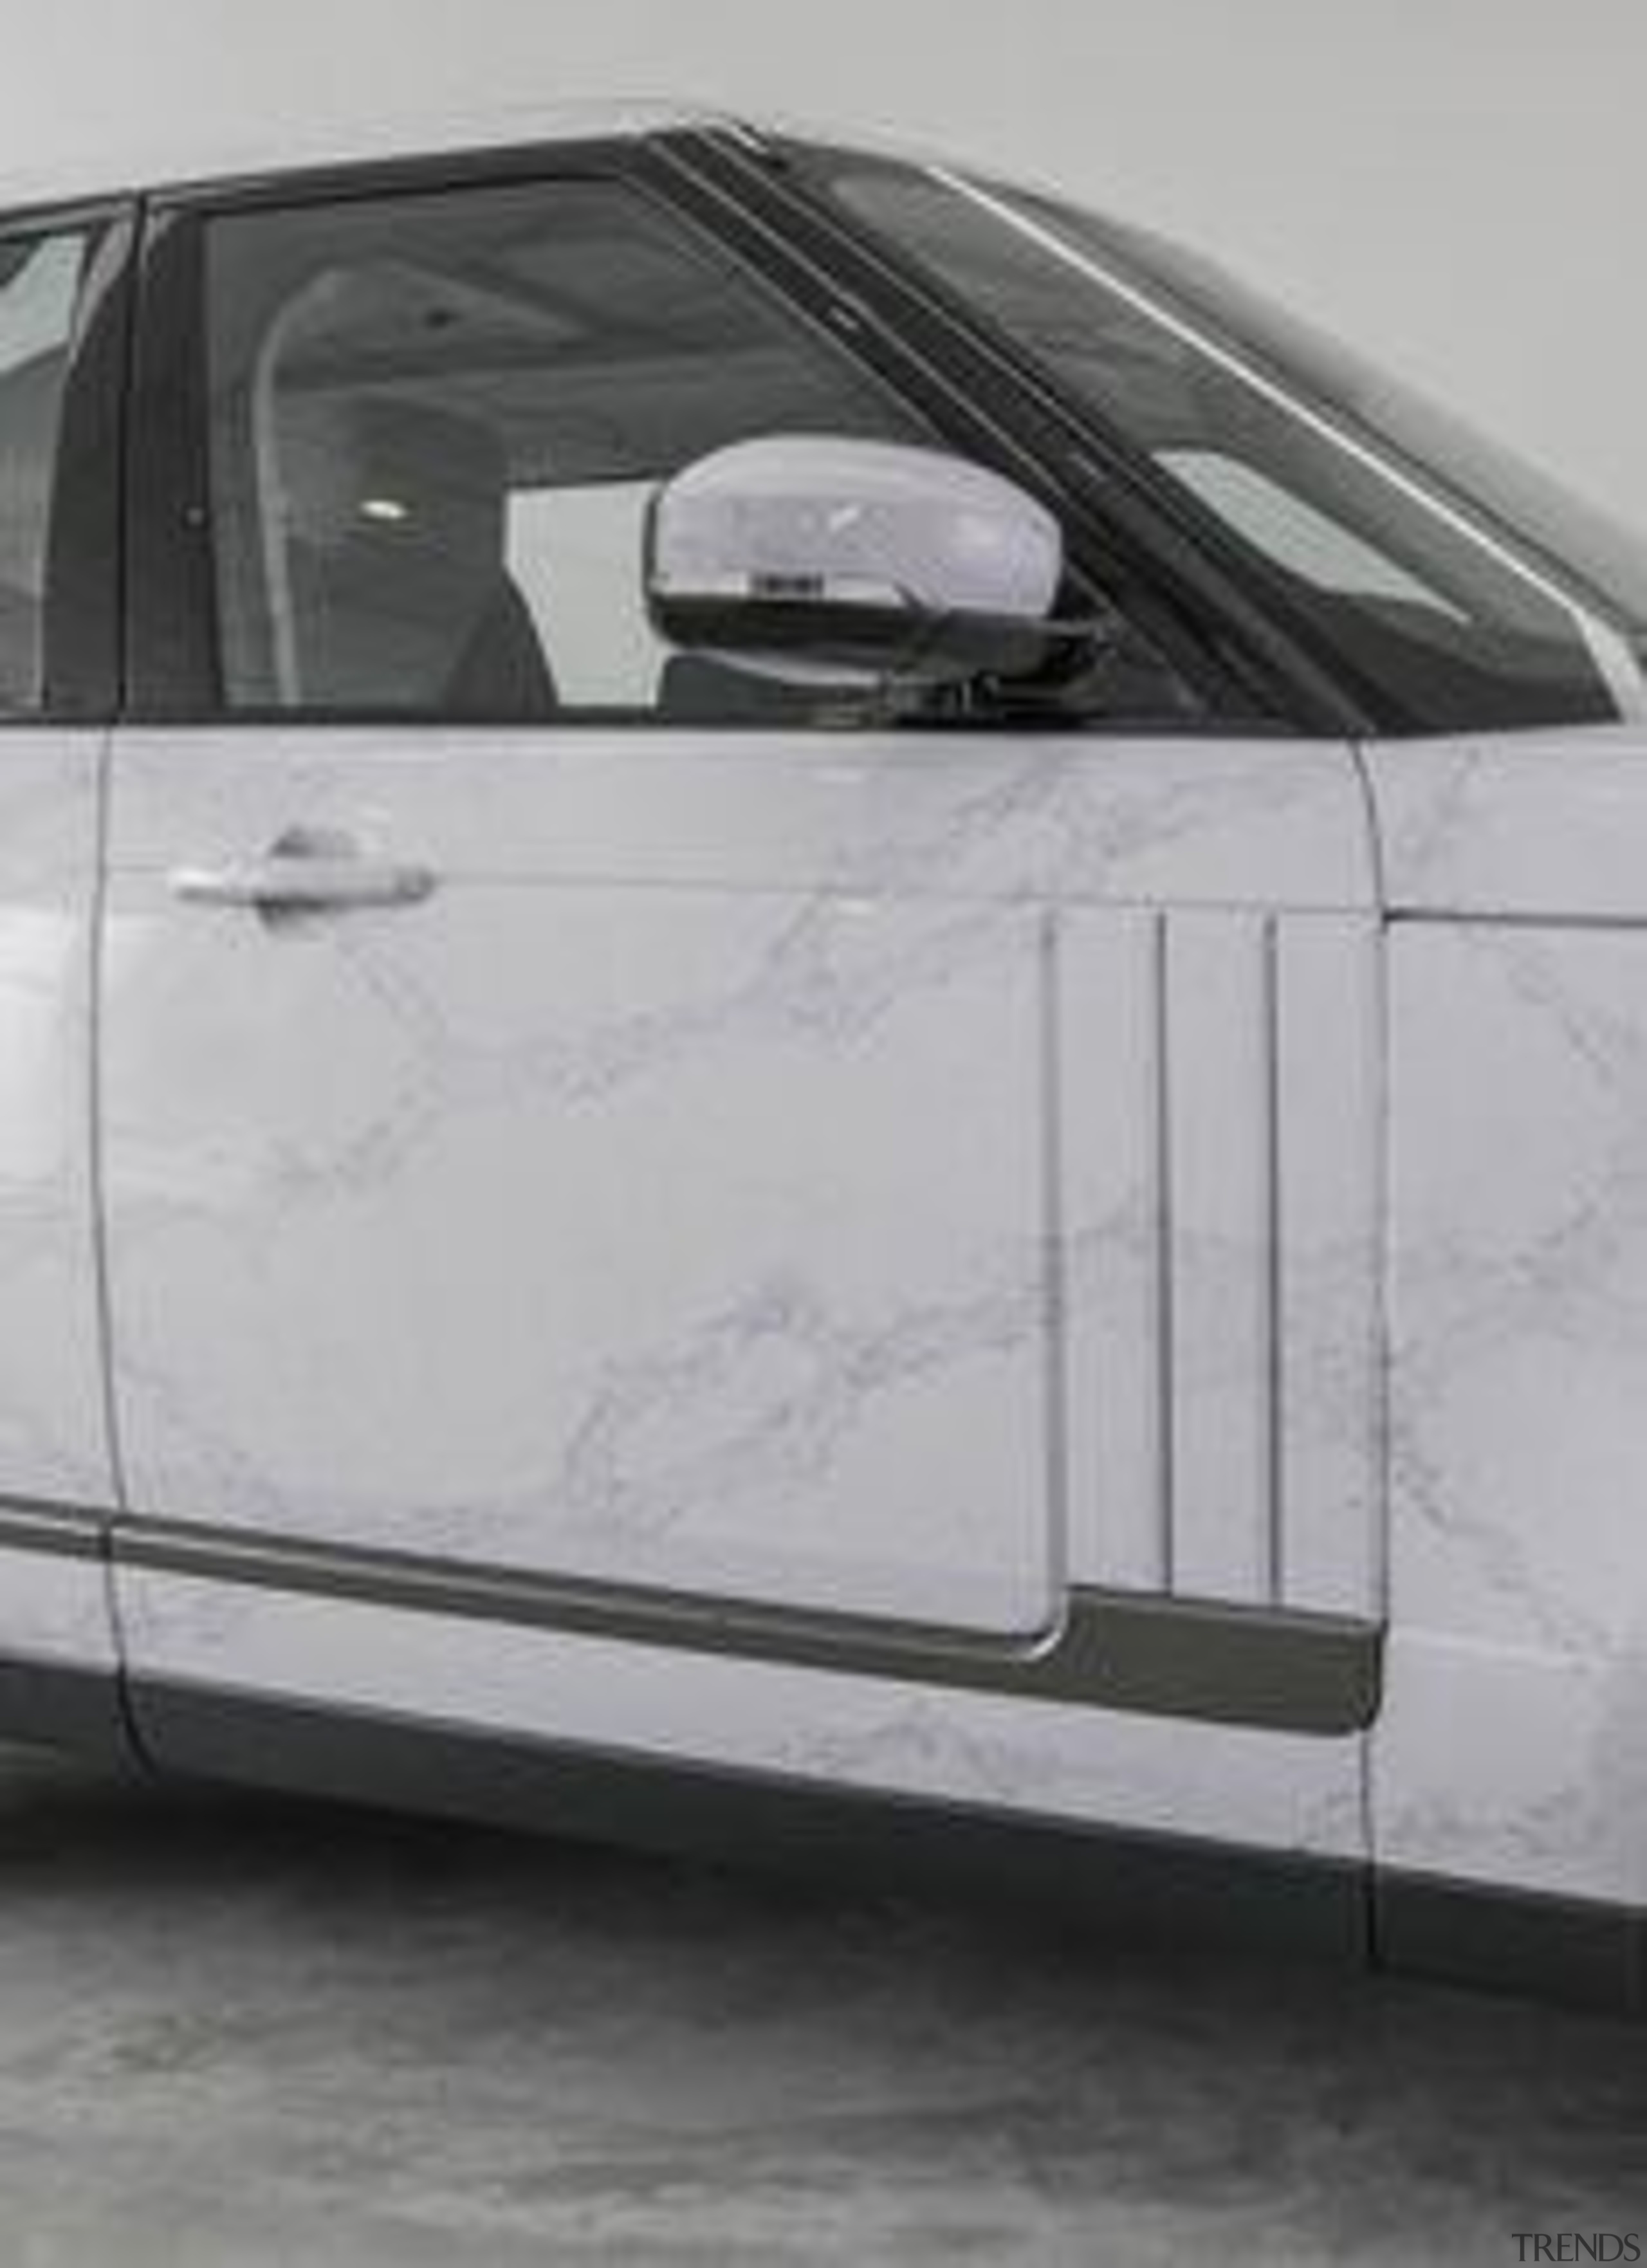 Caesarstone Calacatta Nuvo Launch Singapore Range Rover auto part, automotive design, automotive exterior, automotive wheel system, bumper, car, executive car, family car, floor, grille, hood, luxury vehicle, mid size car, motor vehicle, personal luxury car, sedan, vehicle, vehicle door, wheel, gray, black